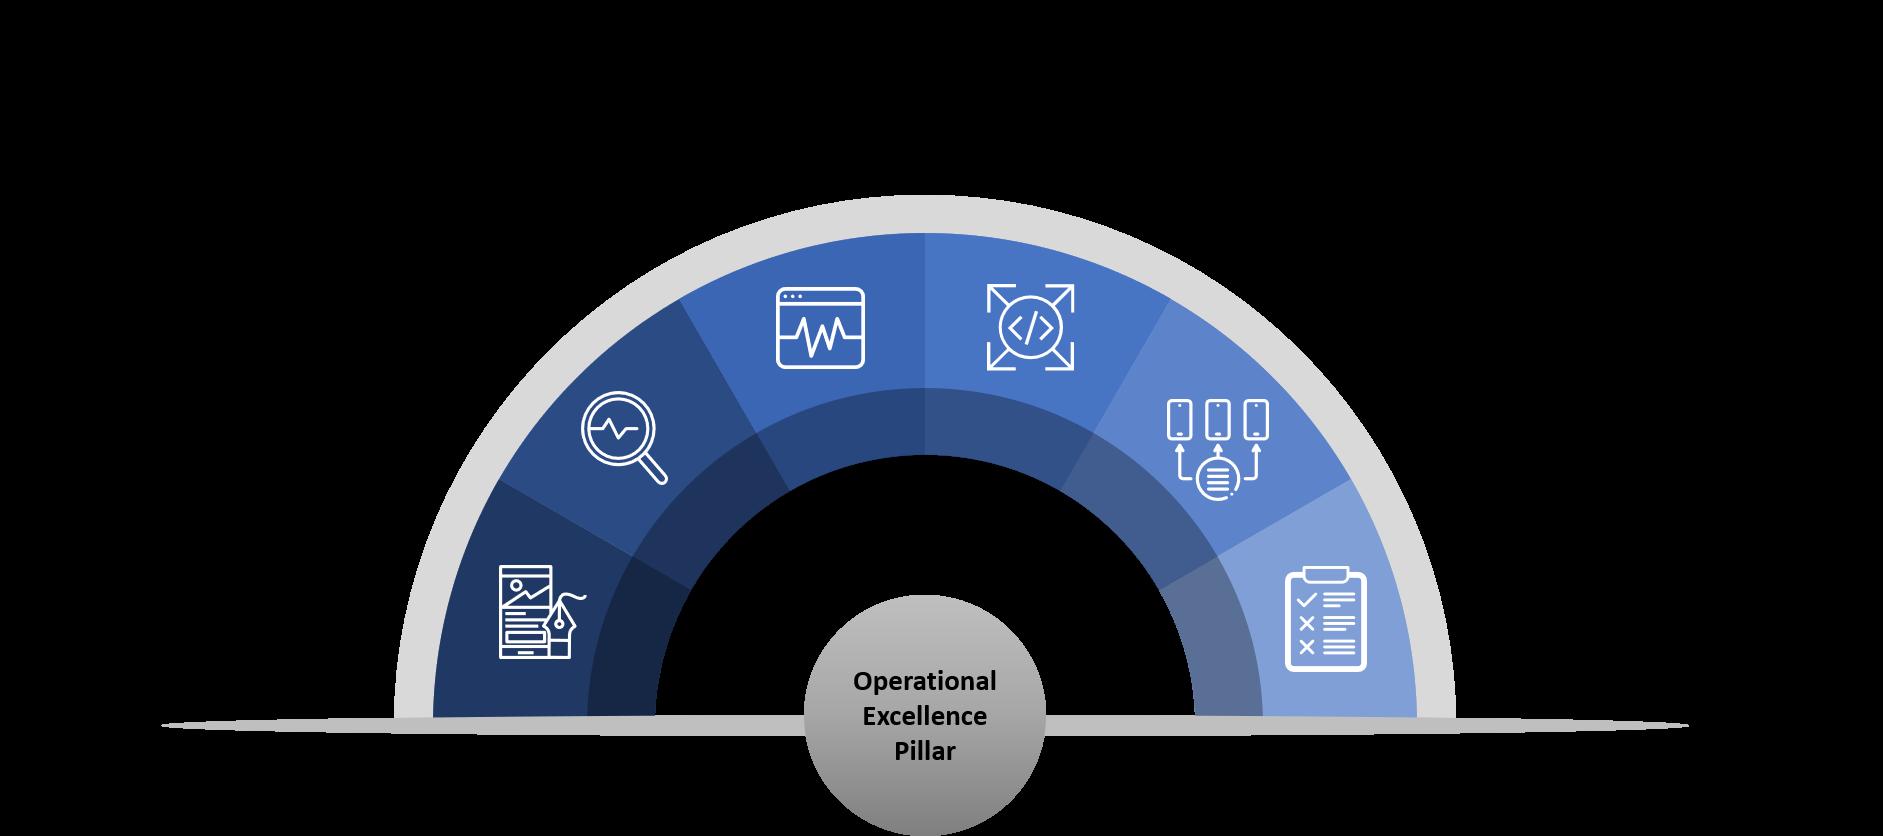 Operational Excellence Pillar